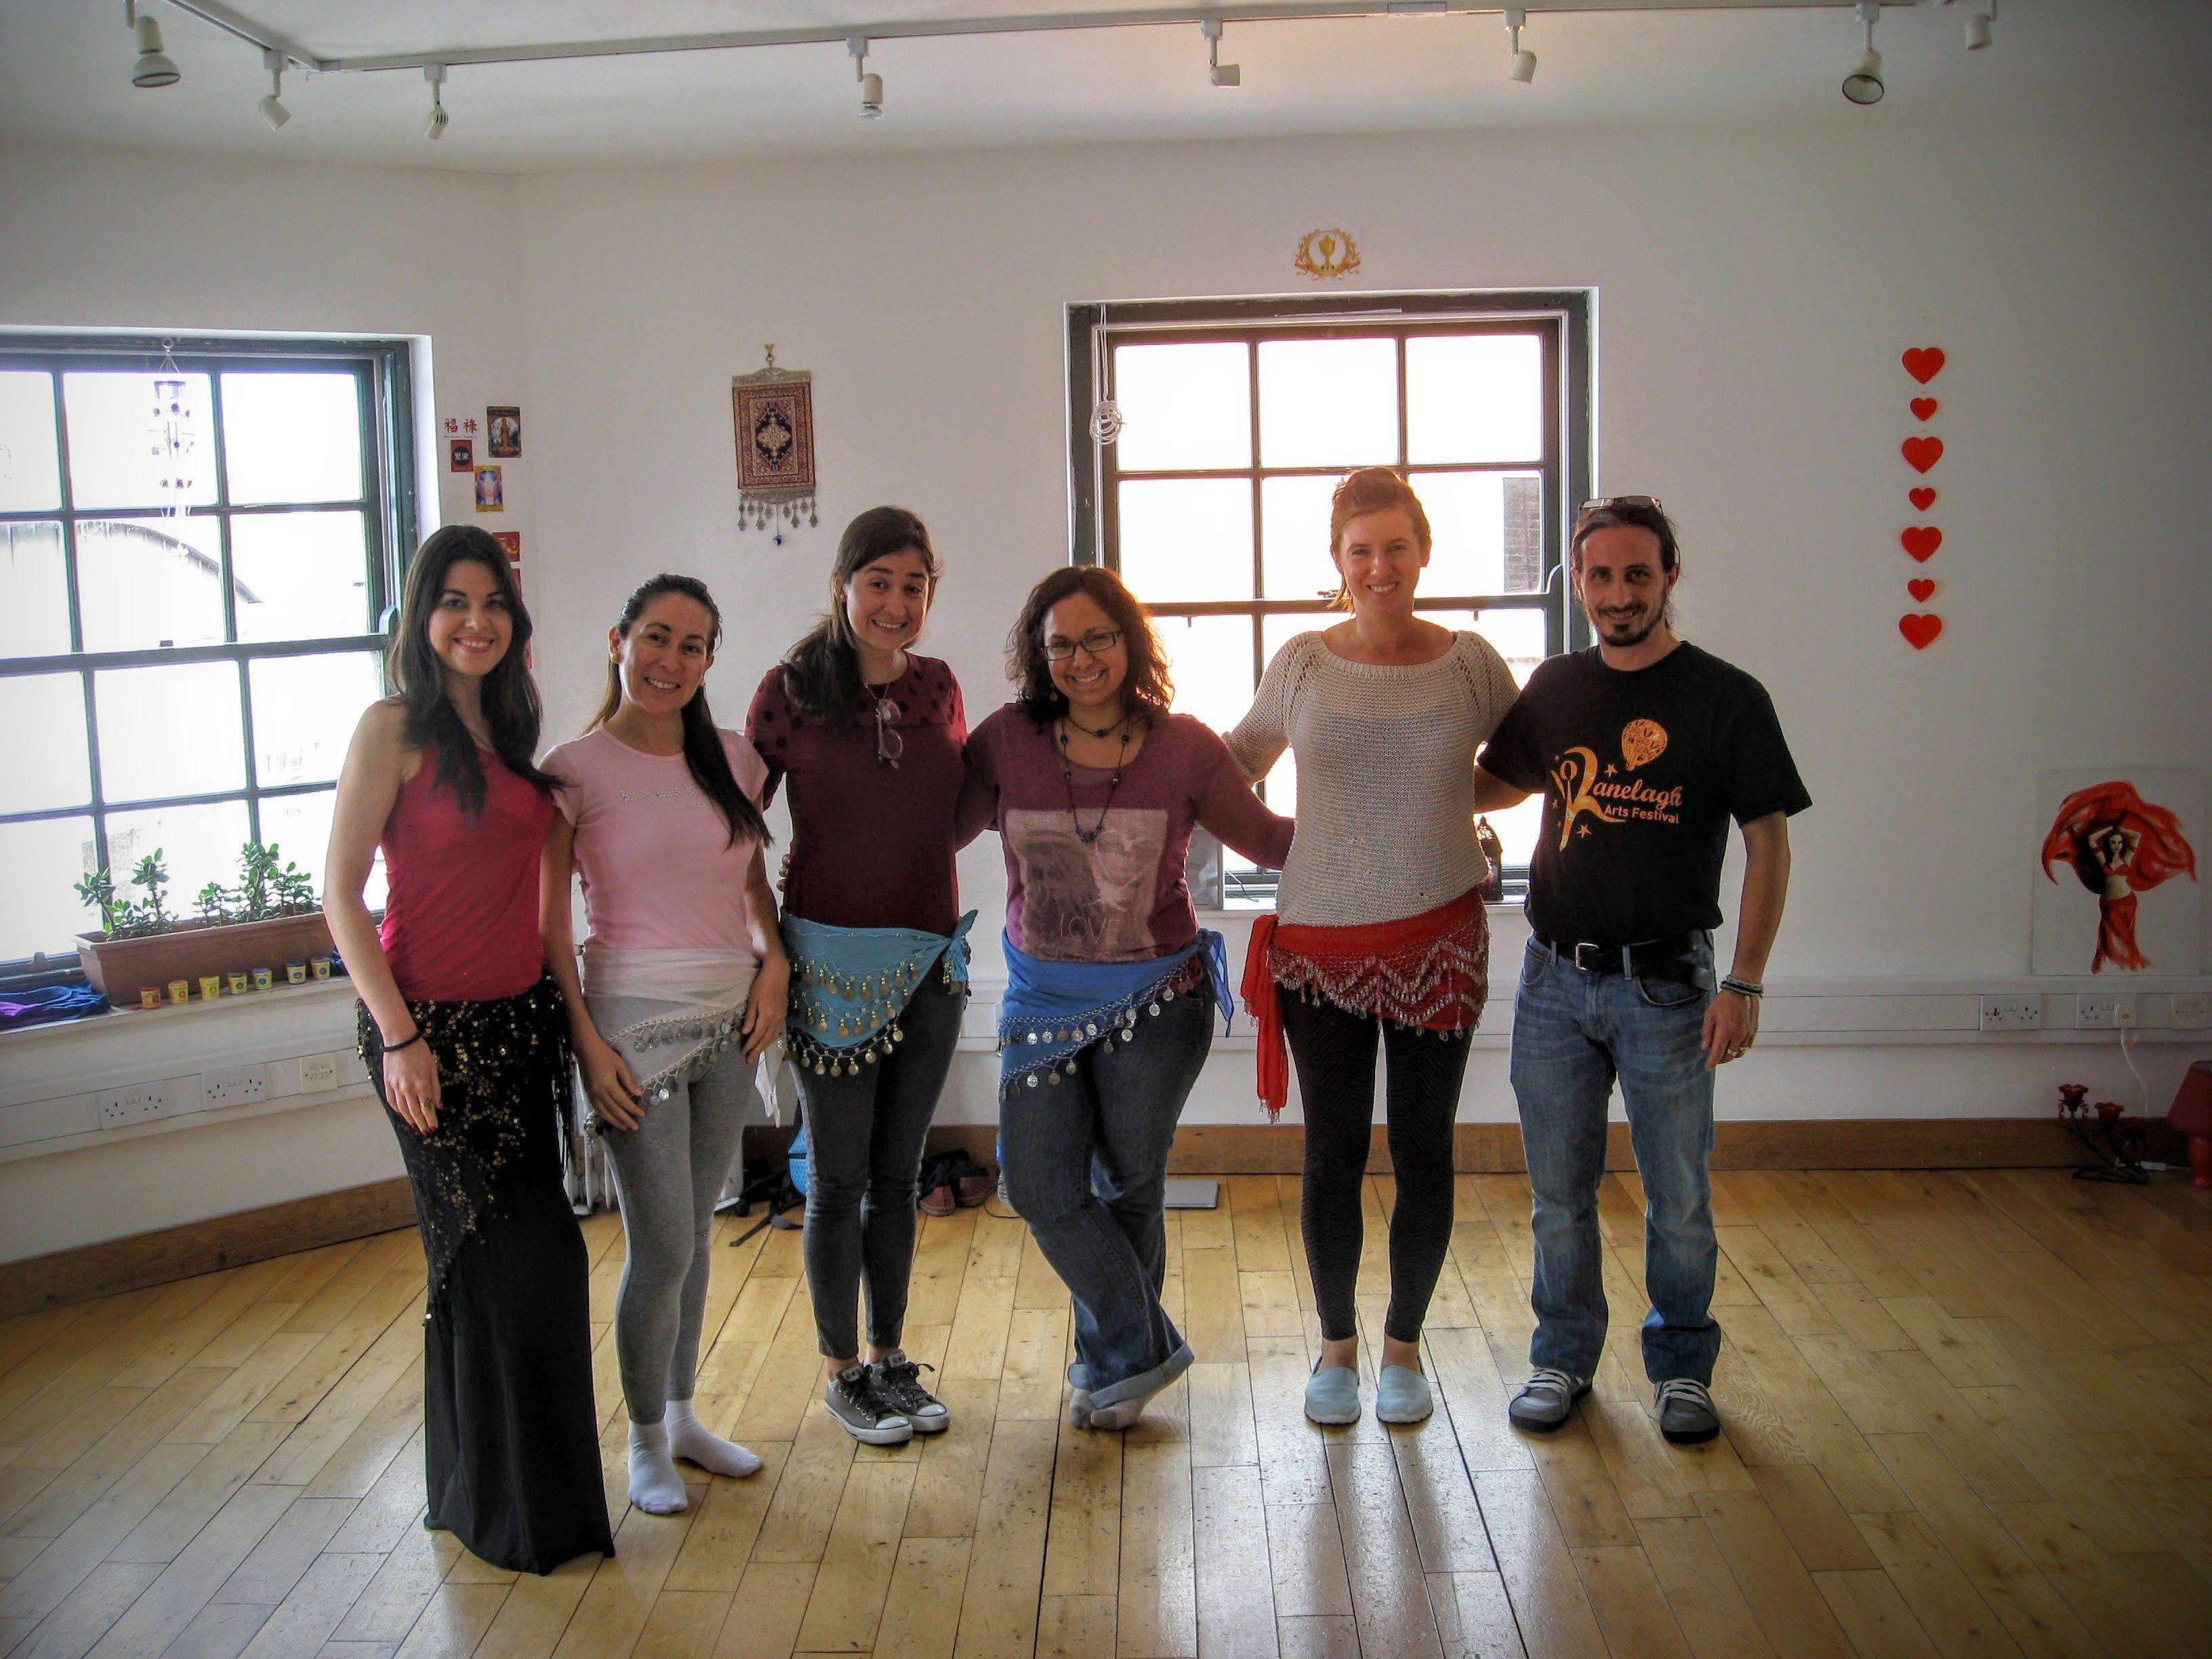 Dublin Dance and Movement Community